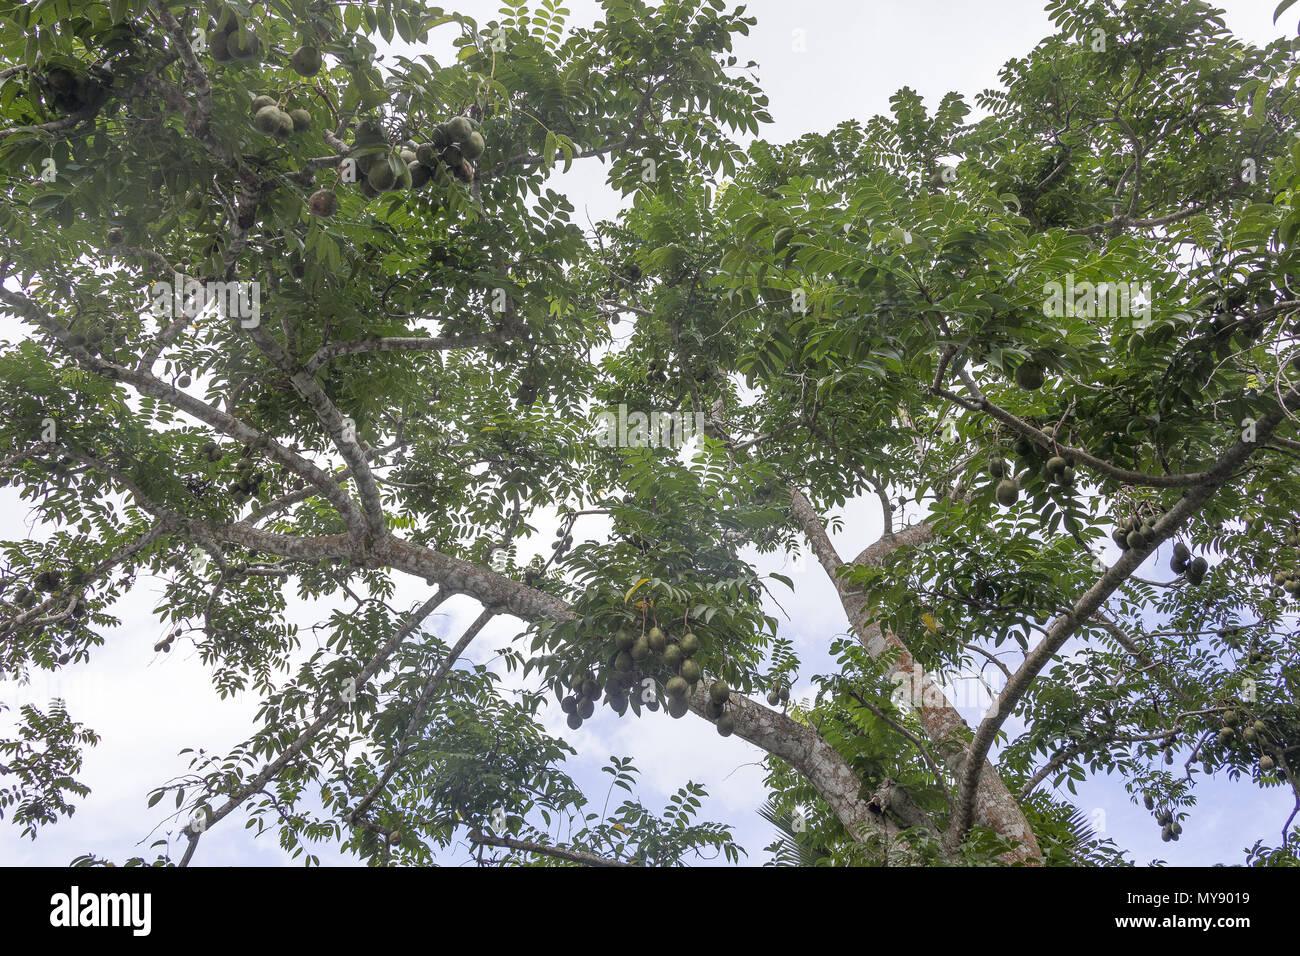 Golden Plum (Spondias dulcis). View up the trunk of a tall tree. Seychelles - Stock Image